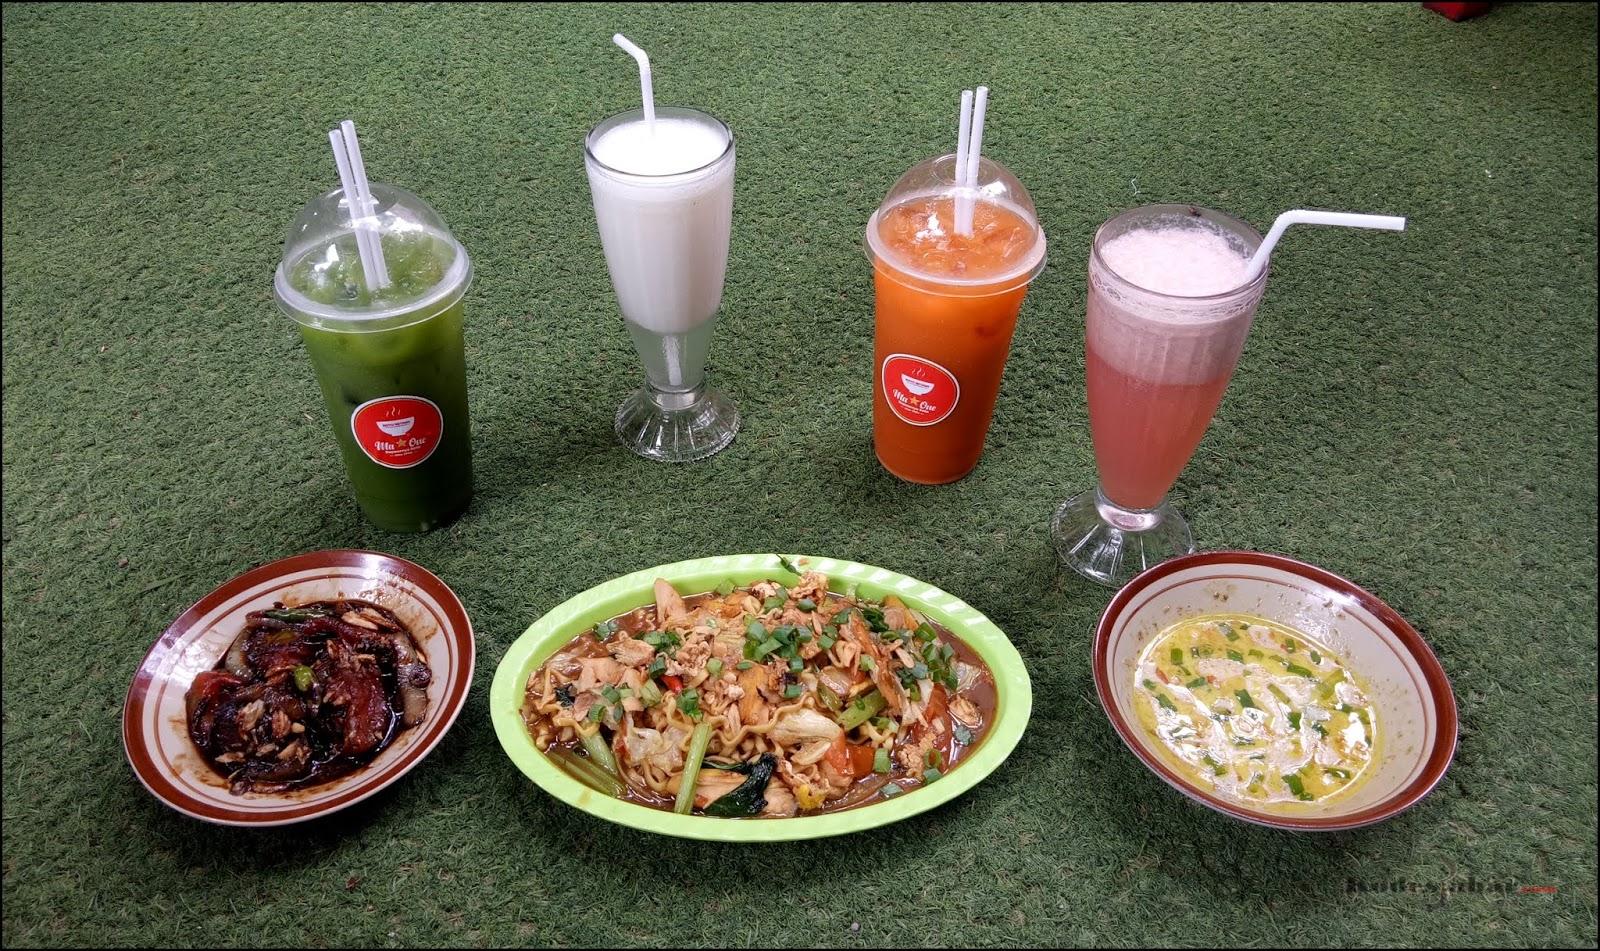 Mastarone Dapoernya Soto, Tempat Kuliner Buat Soto Lover di Bandung